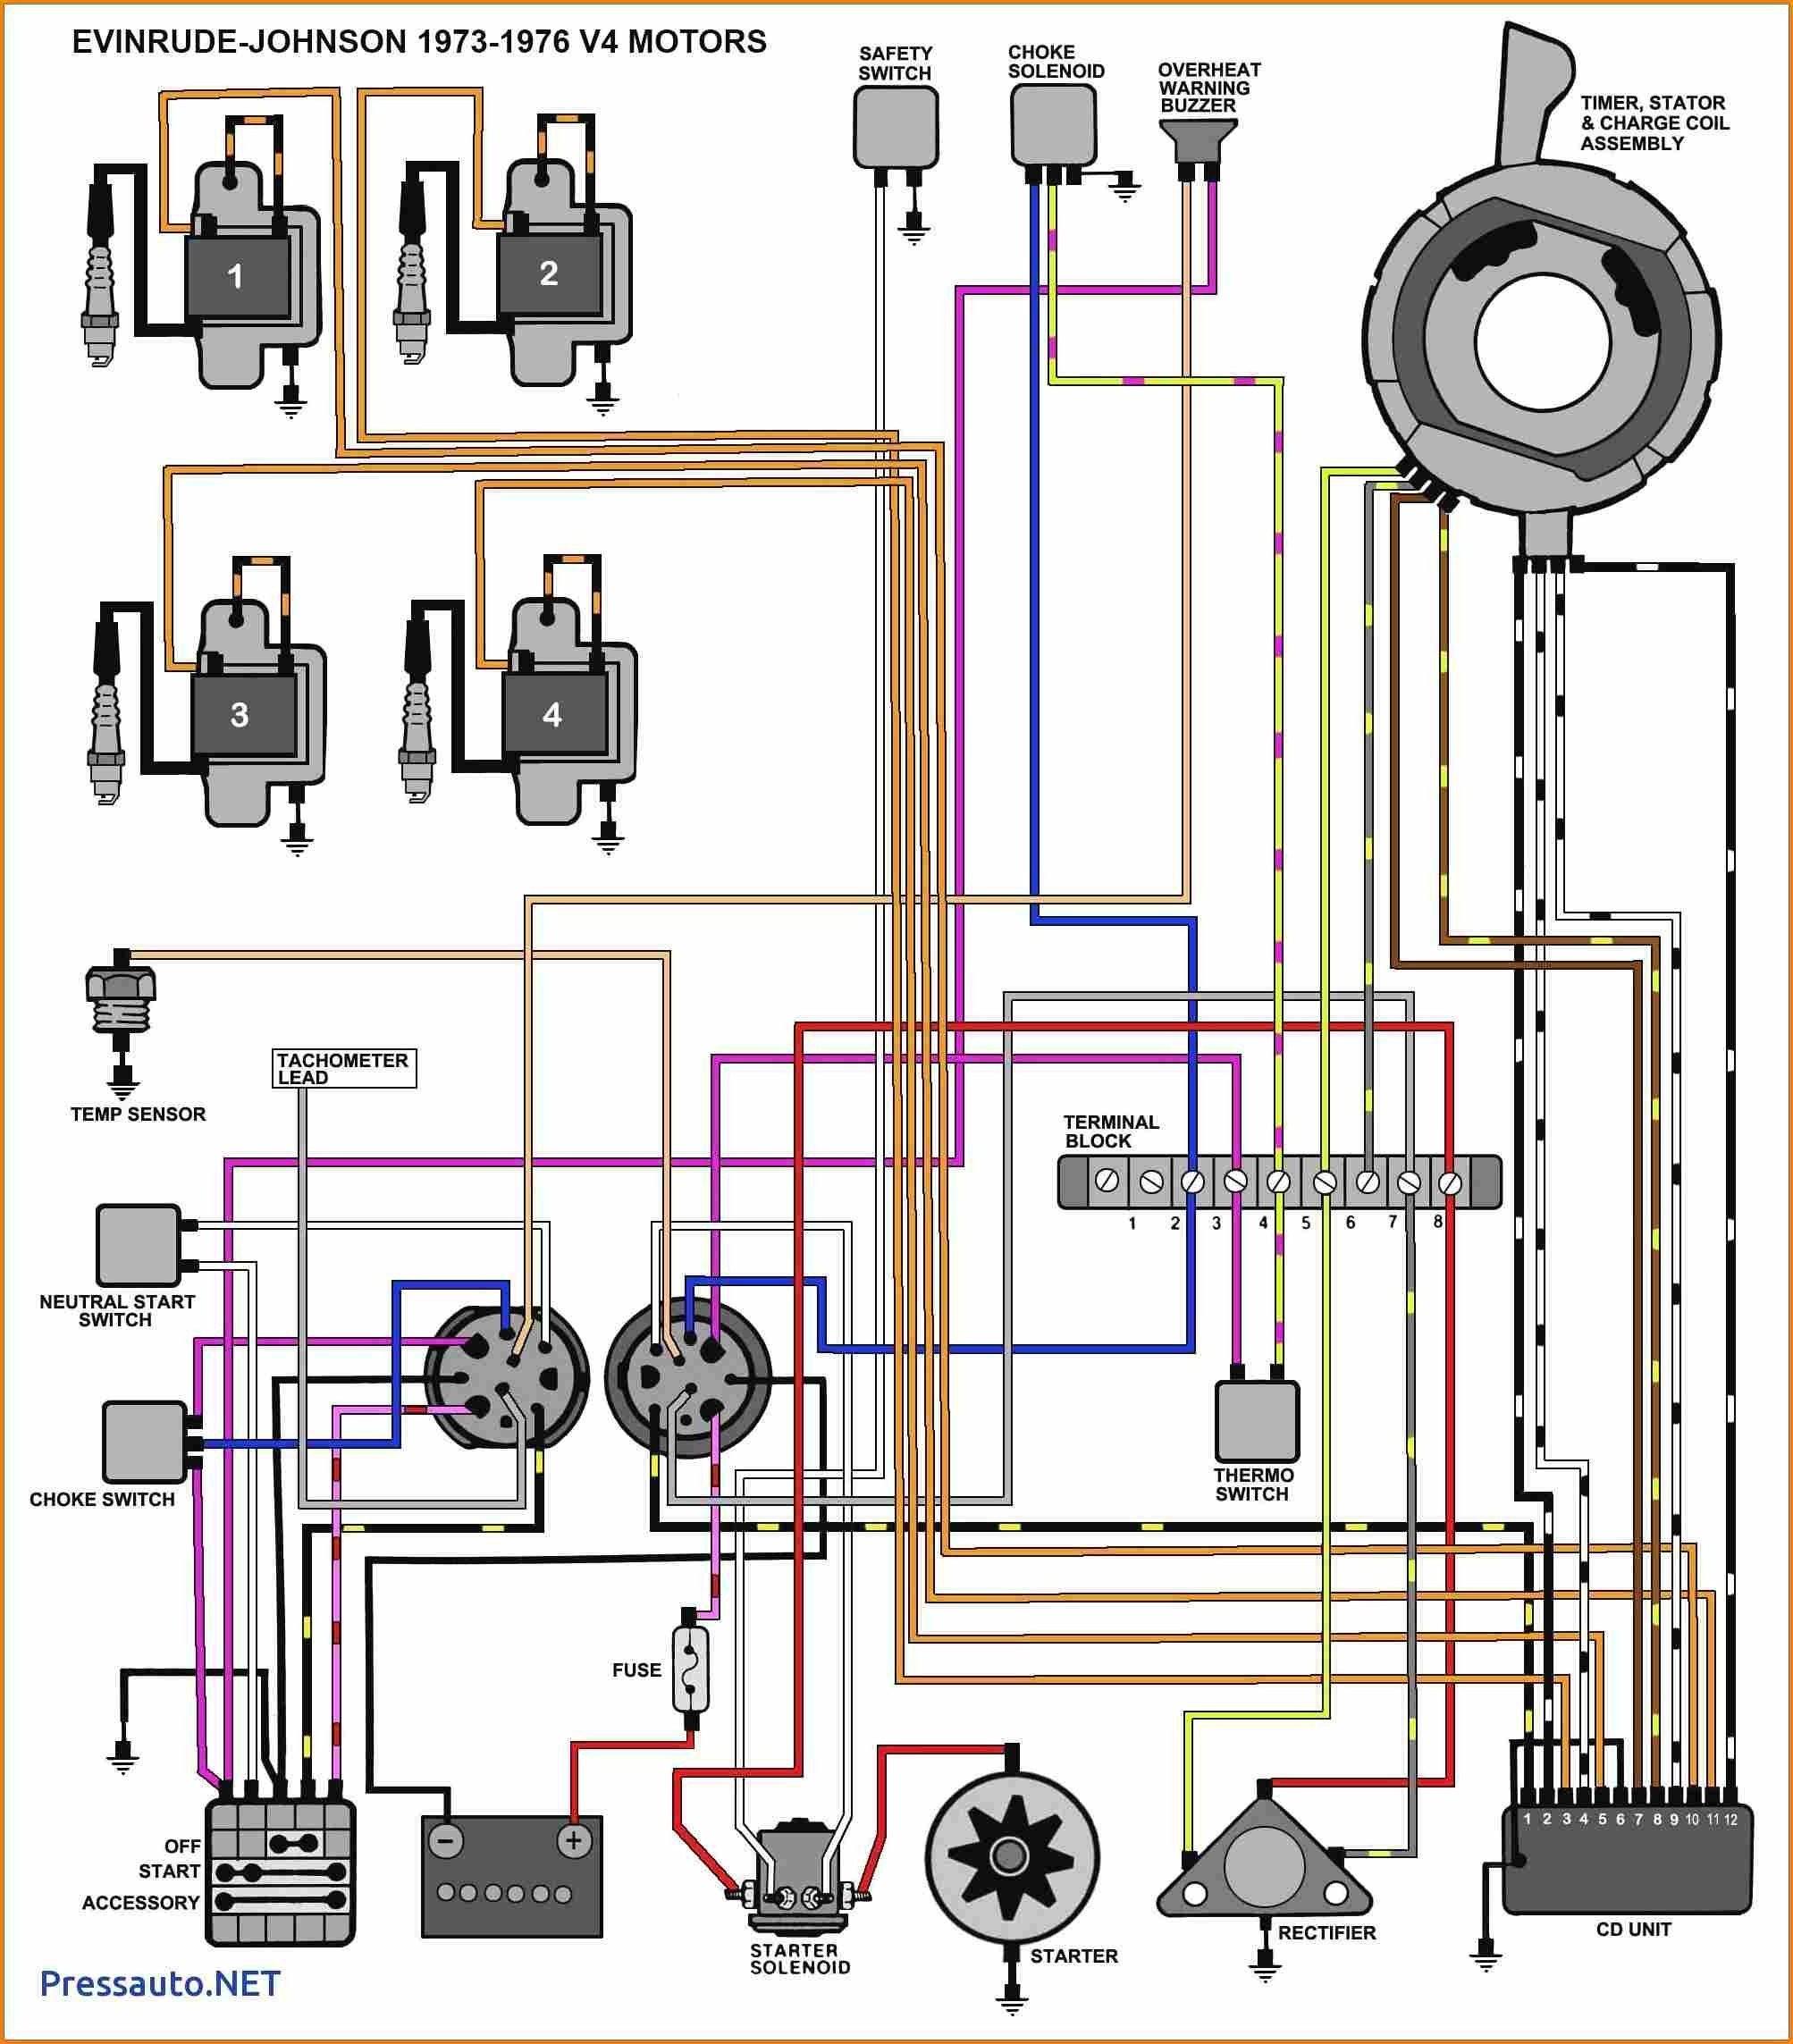 Diagram Fiat Panda 100 Hp Wiring Diagram Full Version Hd Quality Wiring Diagram Pvdiagramxboxer Facilesicuro It